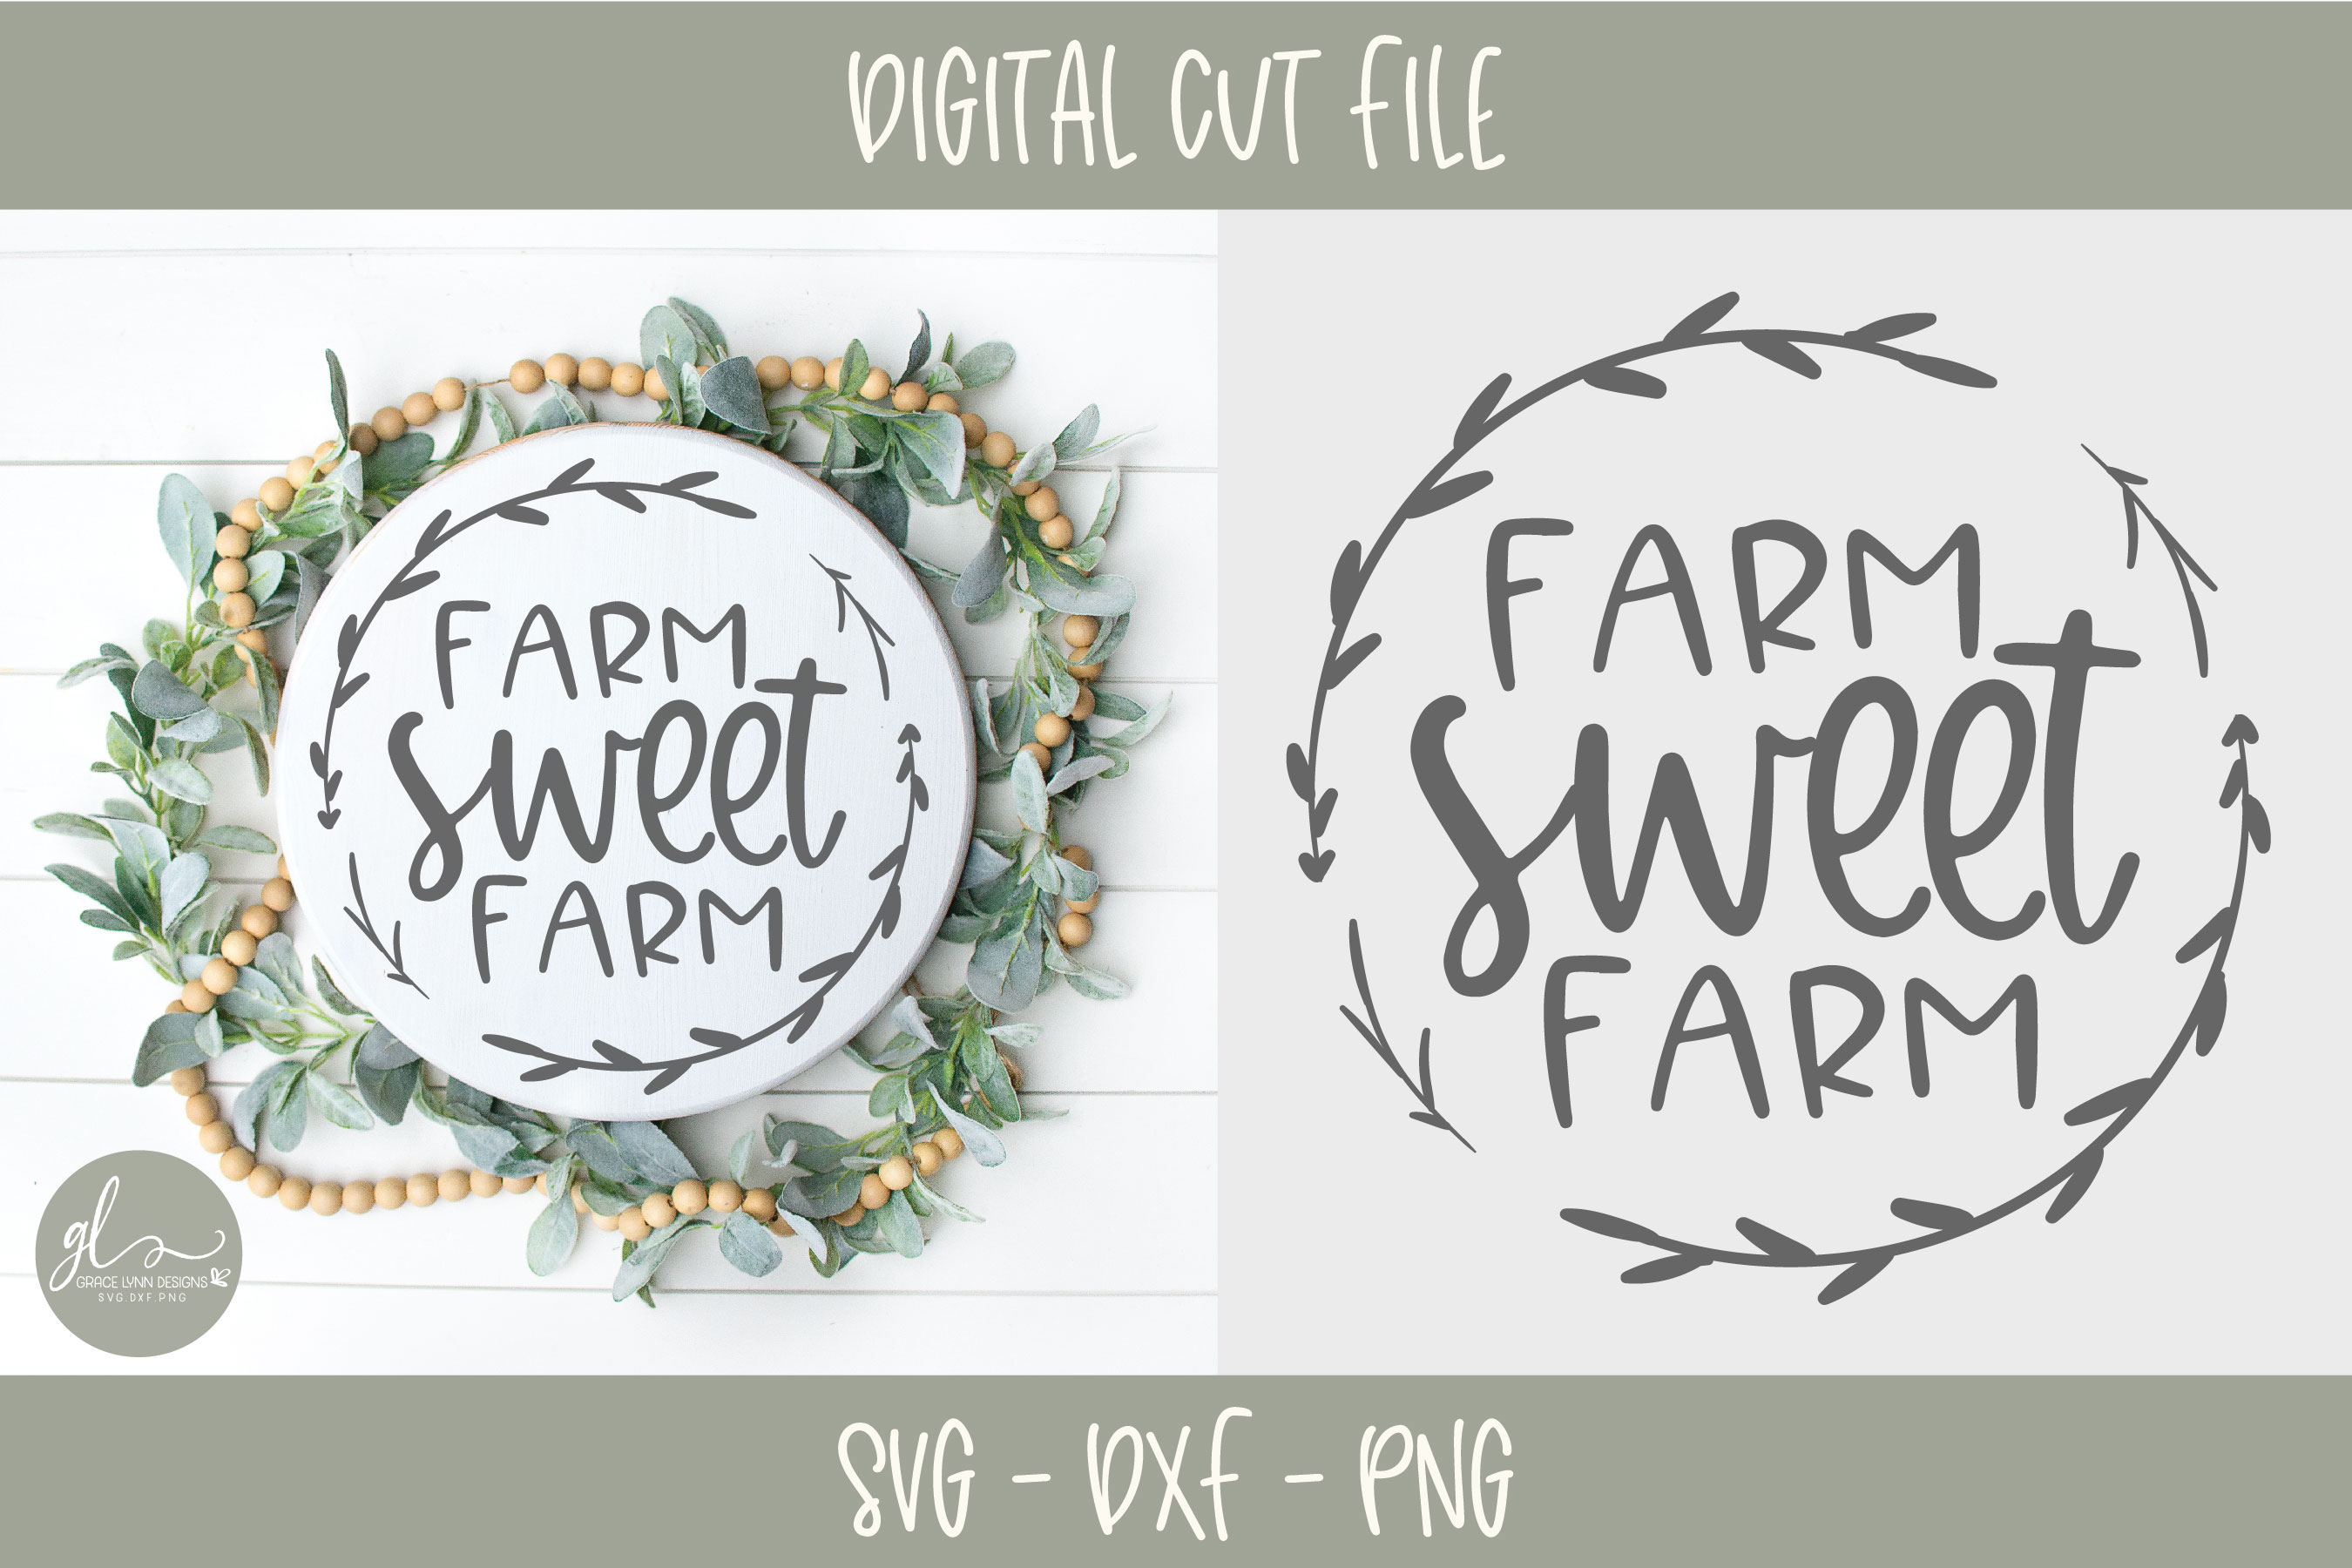 Farm Sweet Farm - Digital Cut File - SVG, DXF & PNG example image 1